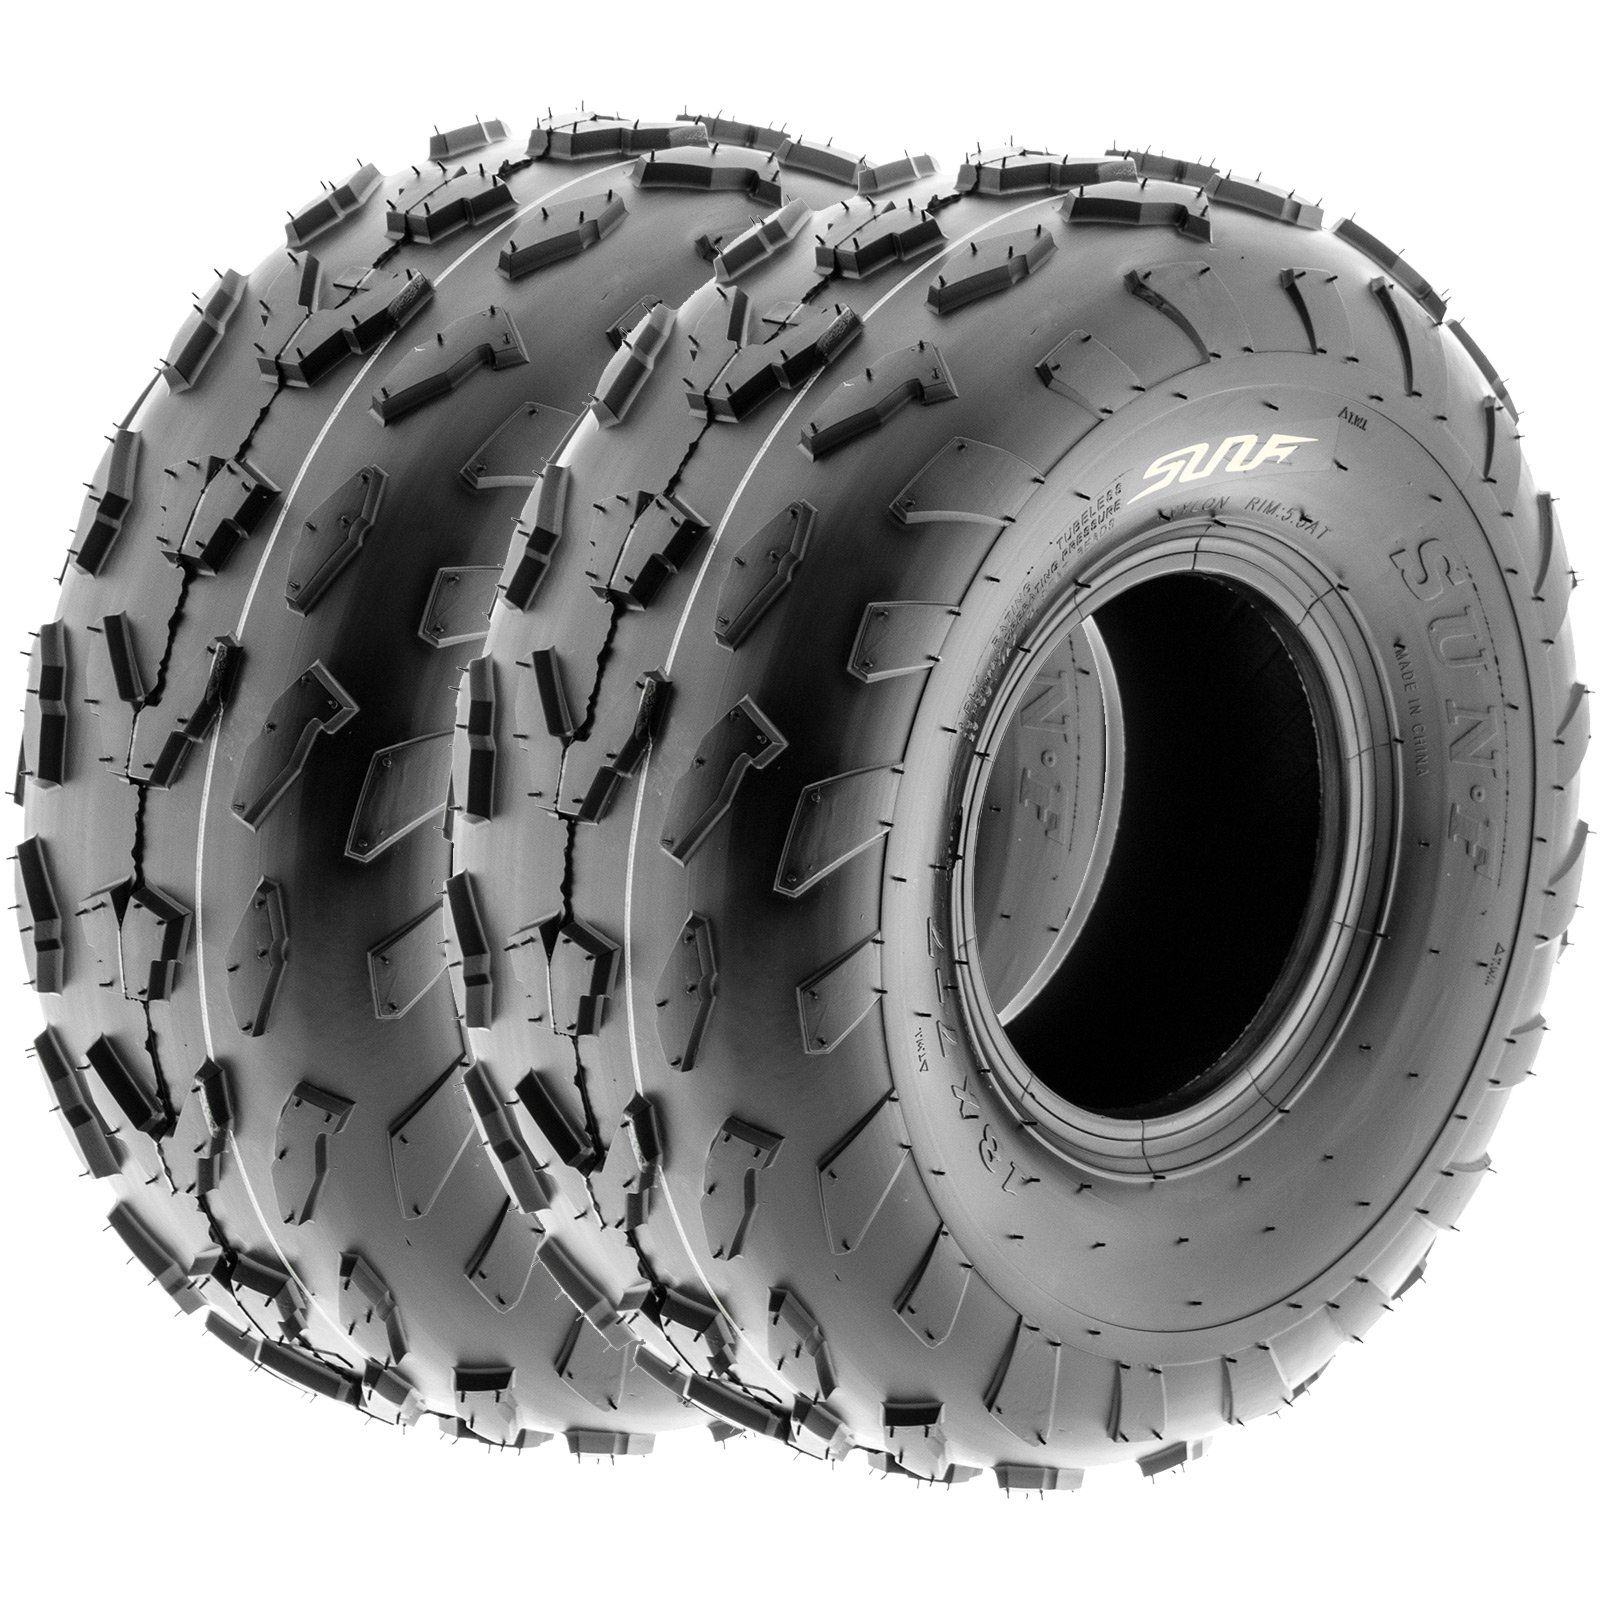 SunF 18x7-7 18x7x7 ATV UTV A/T Quad Race Replacement 4 PR Tubeless Tires A007, [Set of 2] by SunF (Image #1)